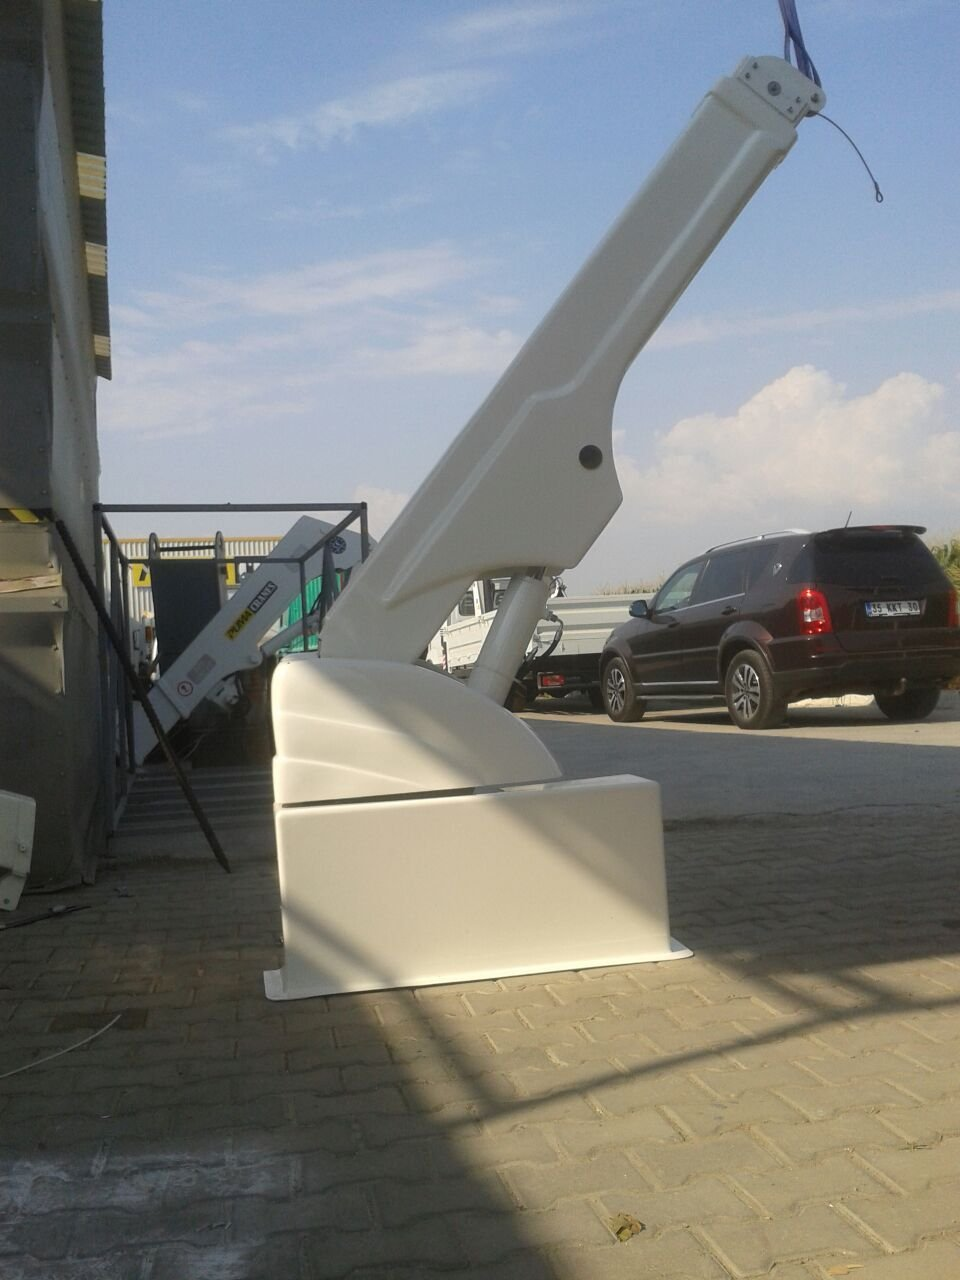 puma-marine-crane384193.jpg